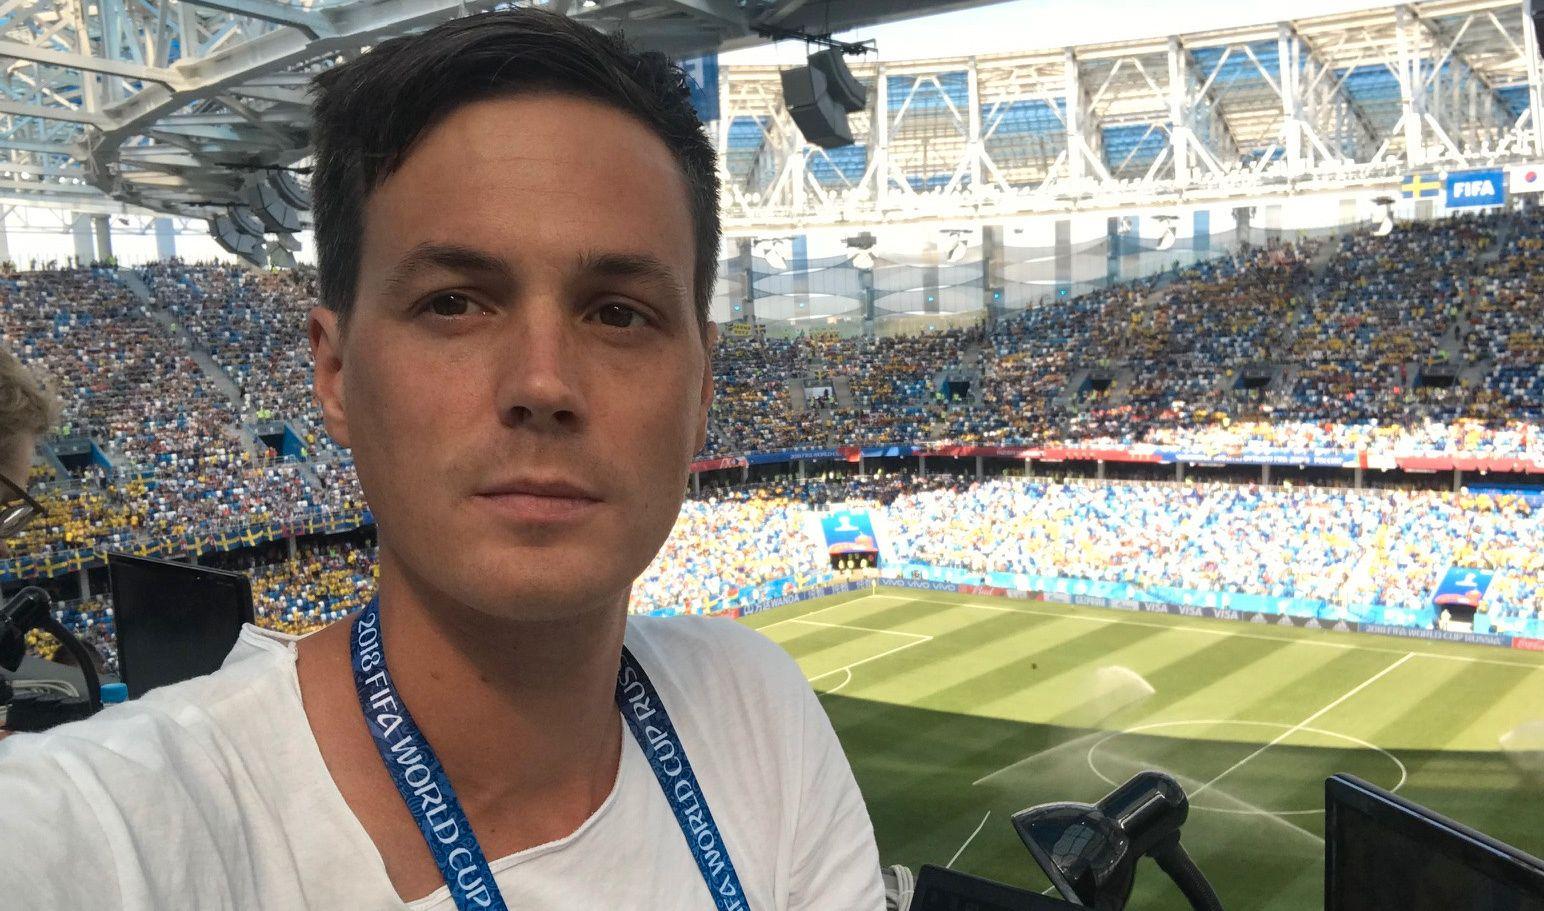 VG I RUSSLAND: Øyvind Brenne følger Sverige-Sør-Korea i Nizjnij Novgorod.